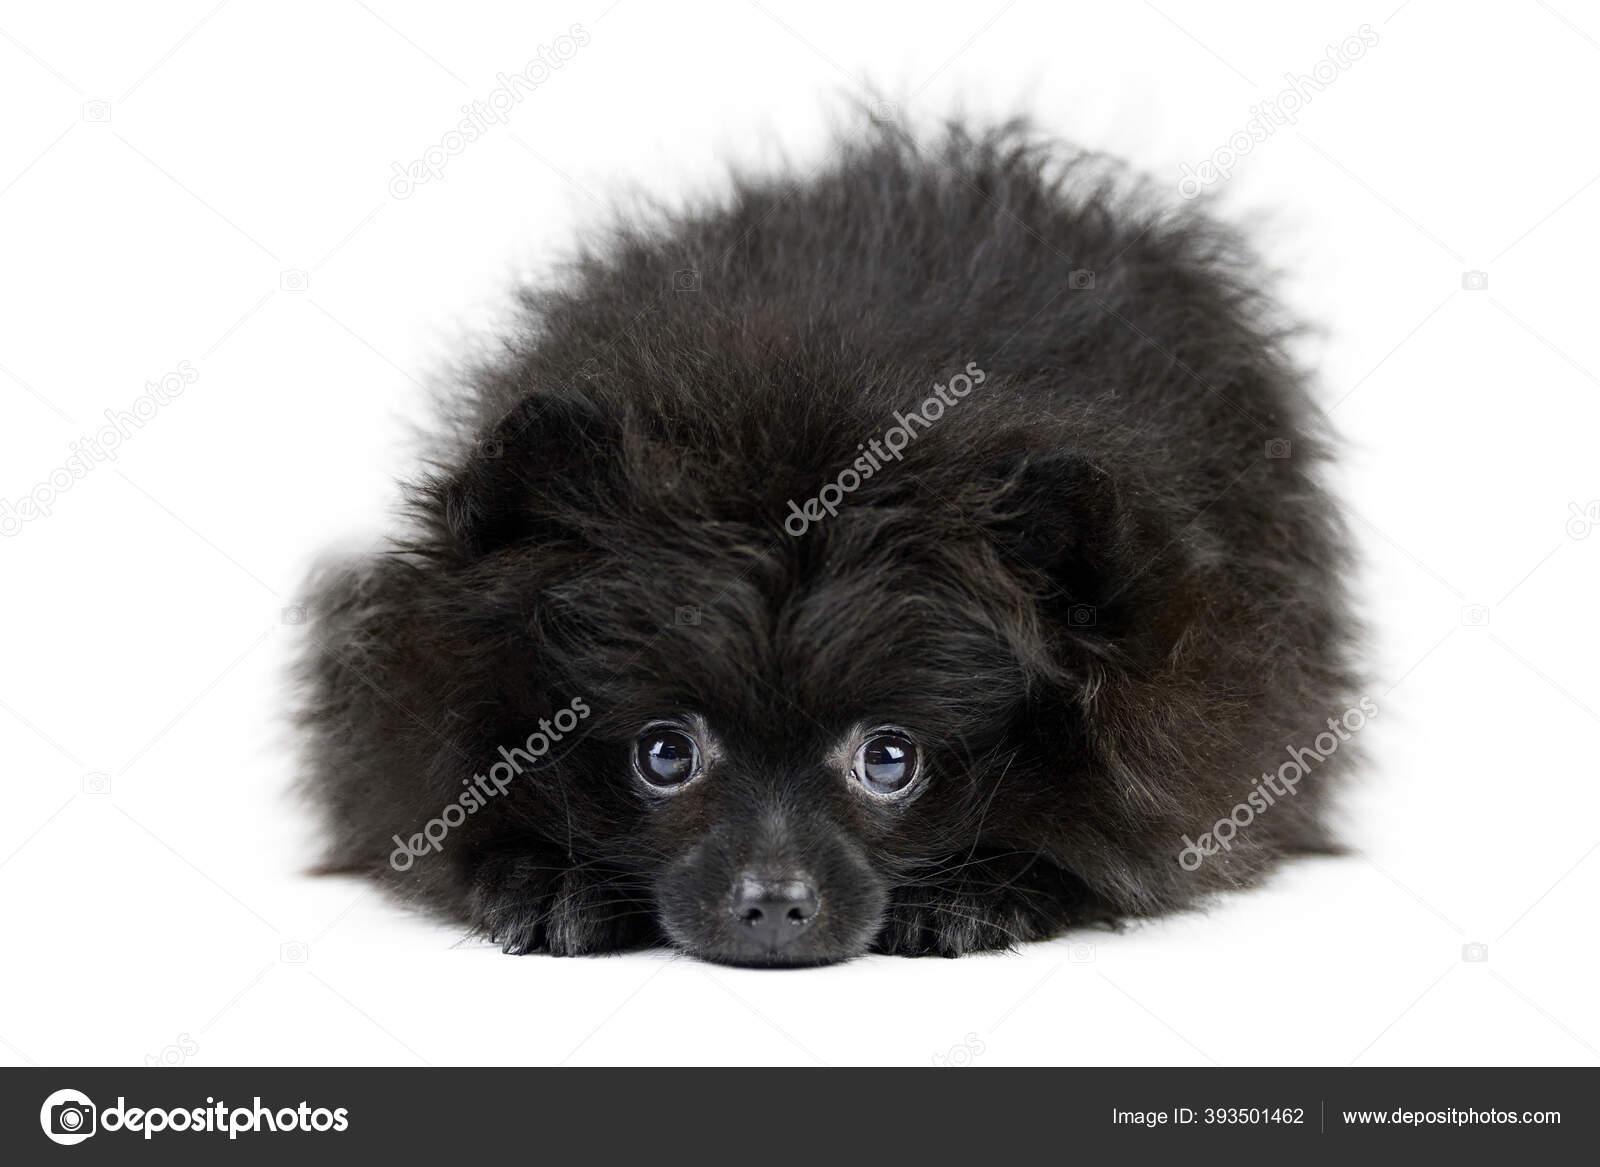 Black Pomeranian Puppy Spitz Isolated Cute Pomeranian White Background Family Stock Photo C Travelarium 393501462